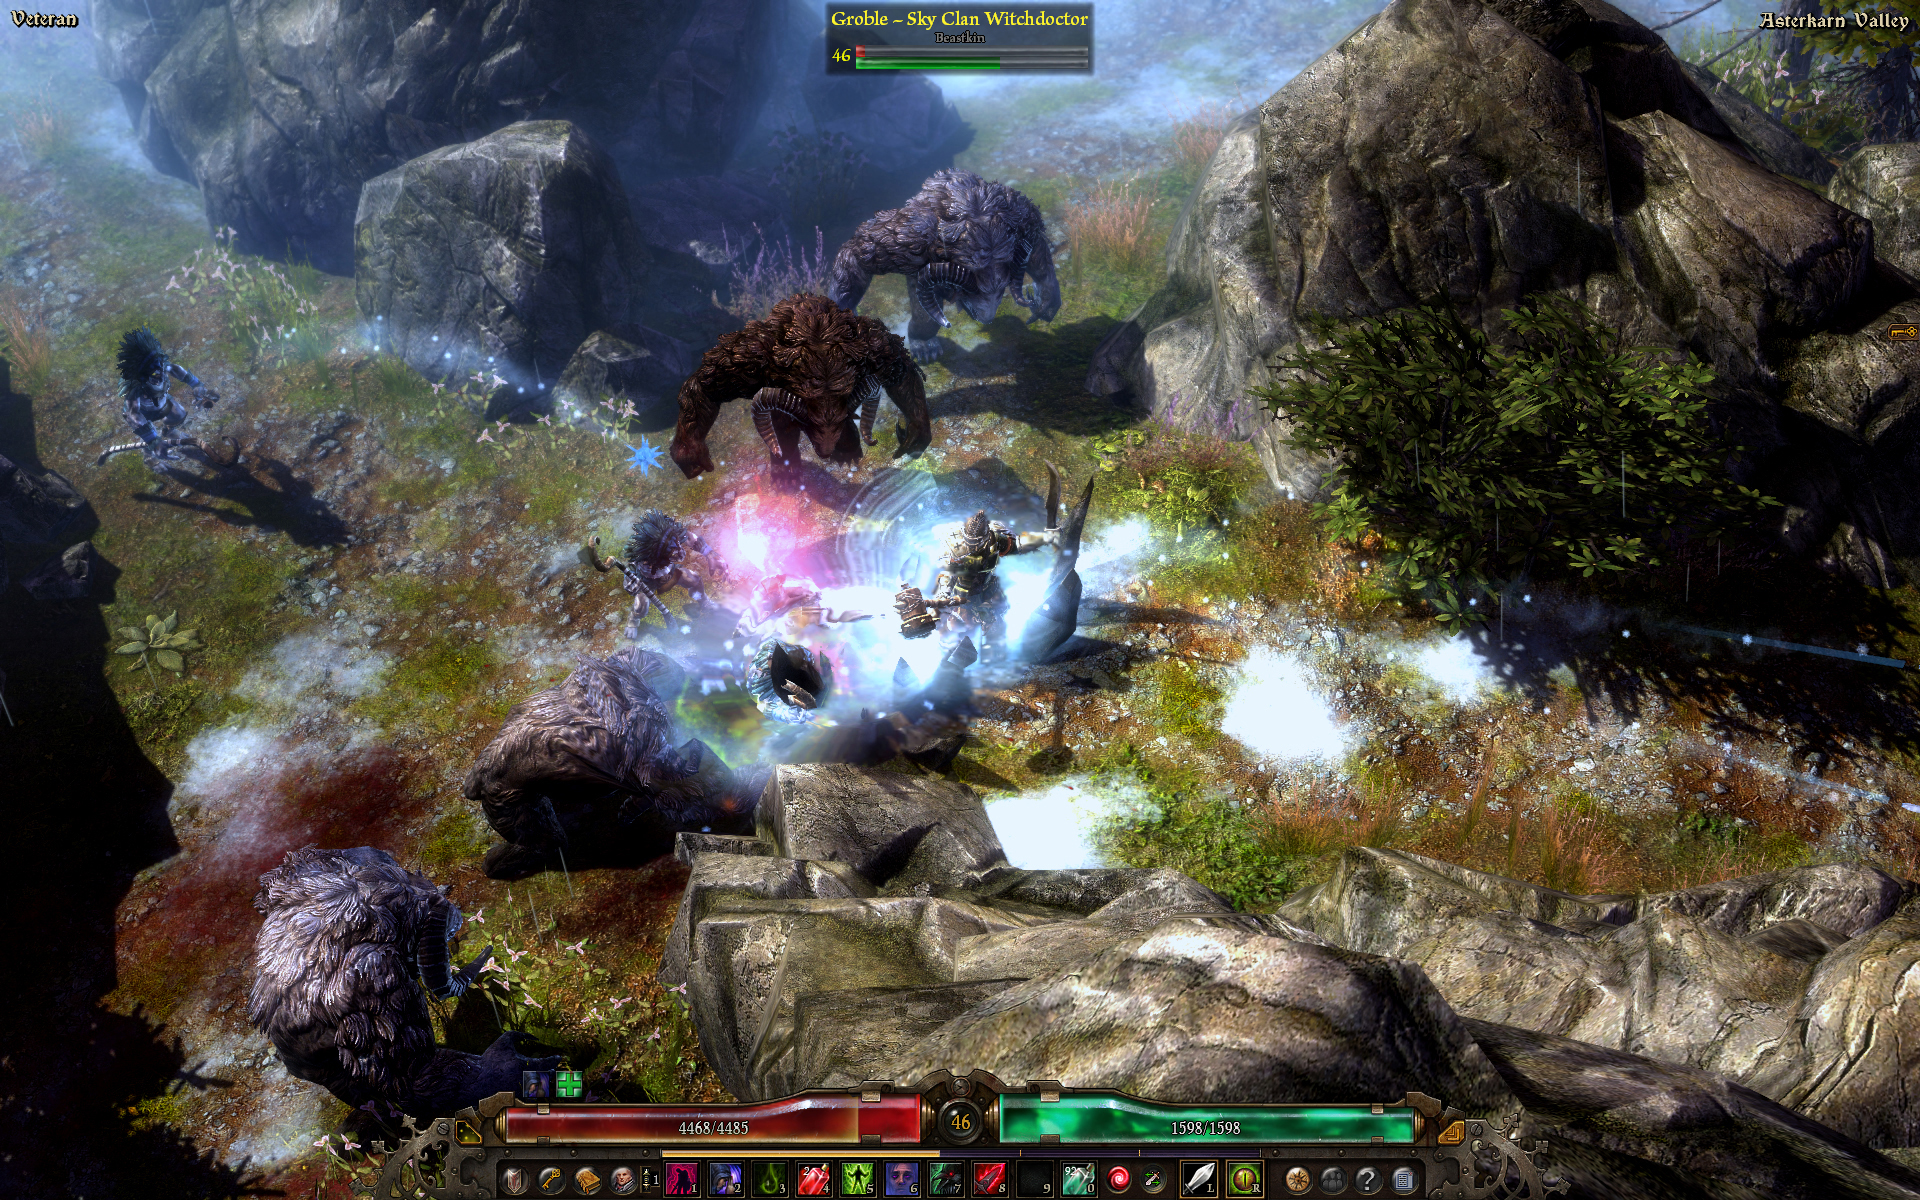 Скриншот к игре Grim Dawn [v 1.0.5.0 + DLC's] (2016) PC | RePack от R.G. Механики